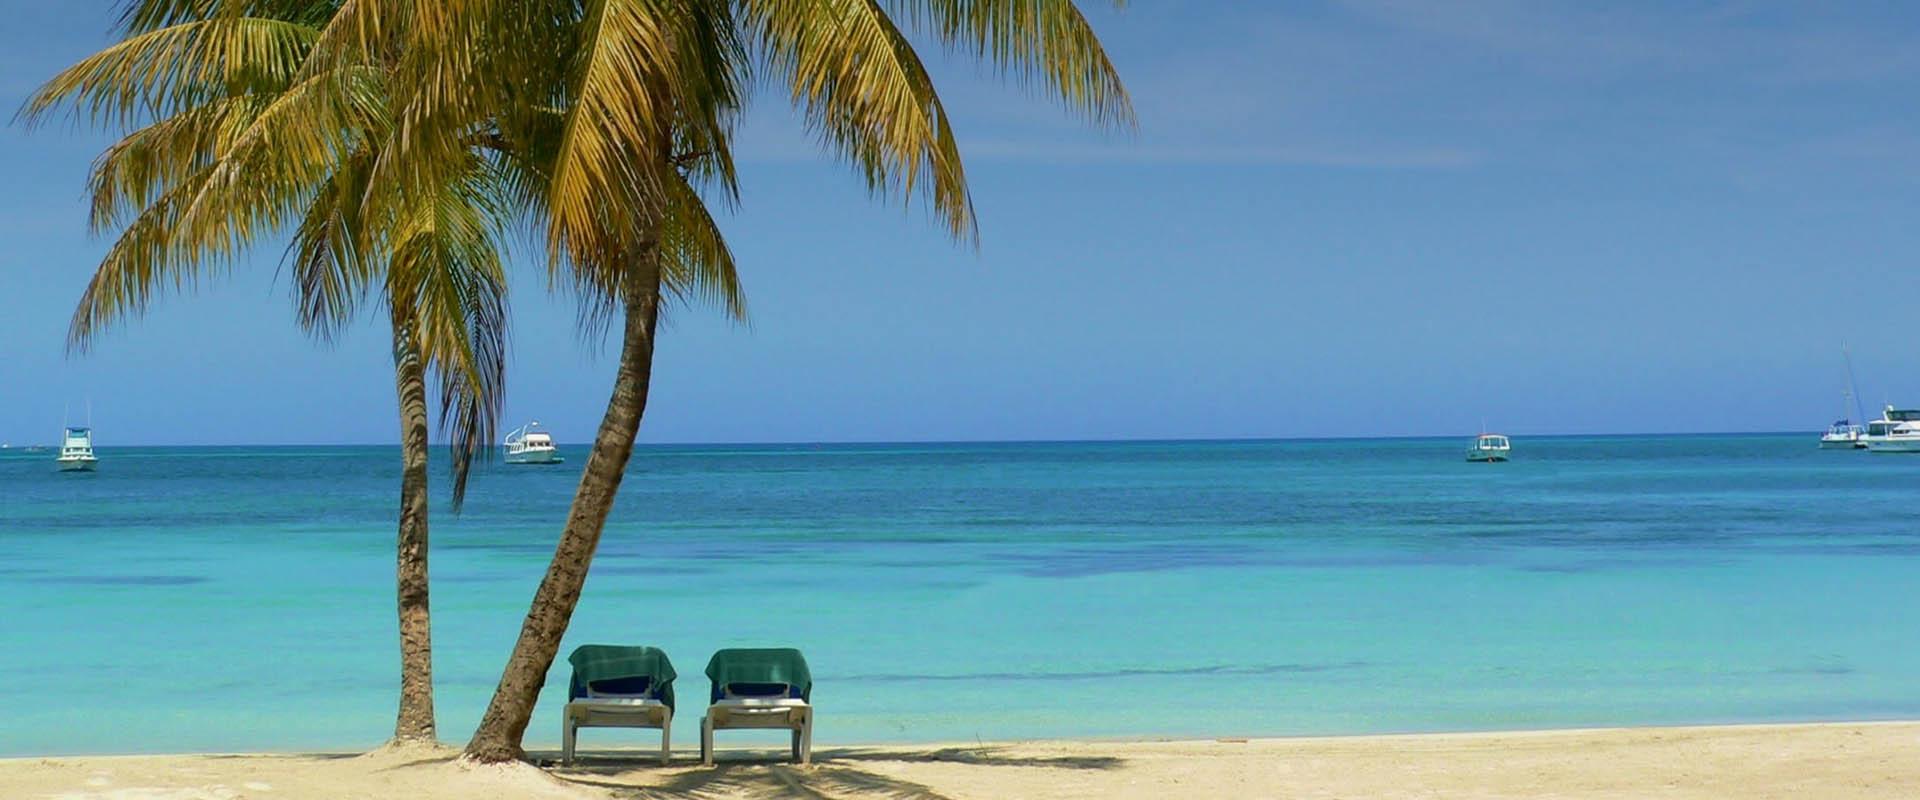 jamaica public holidays 2018 publicholidaysla